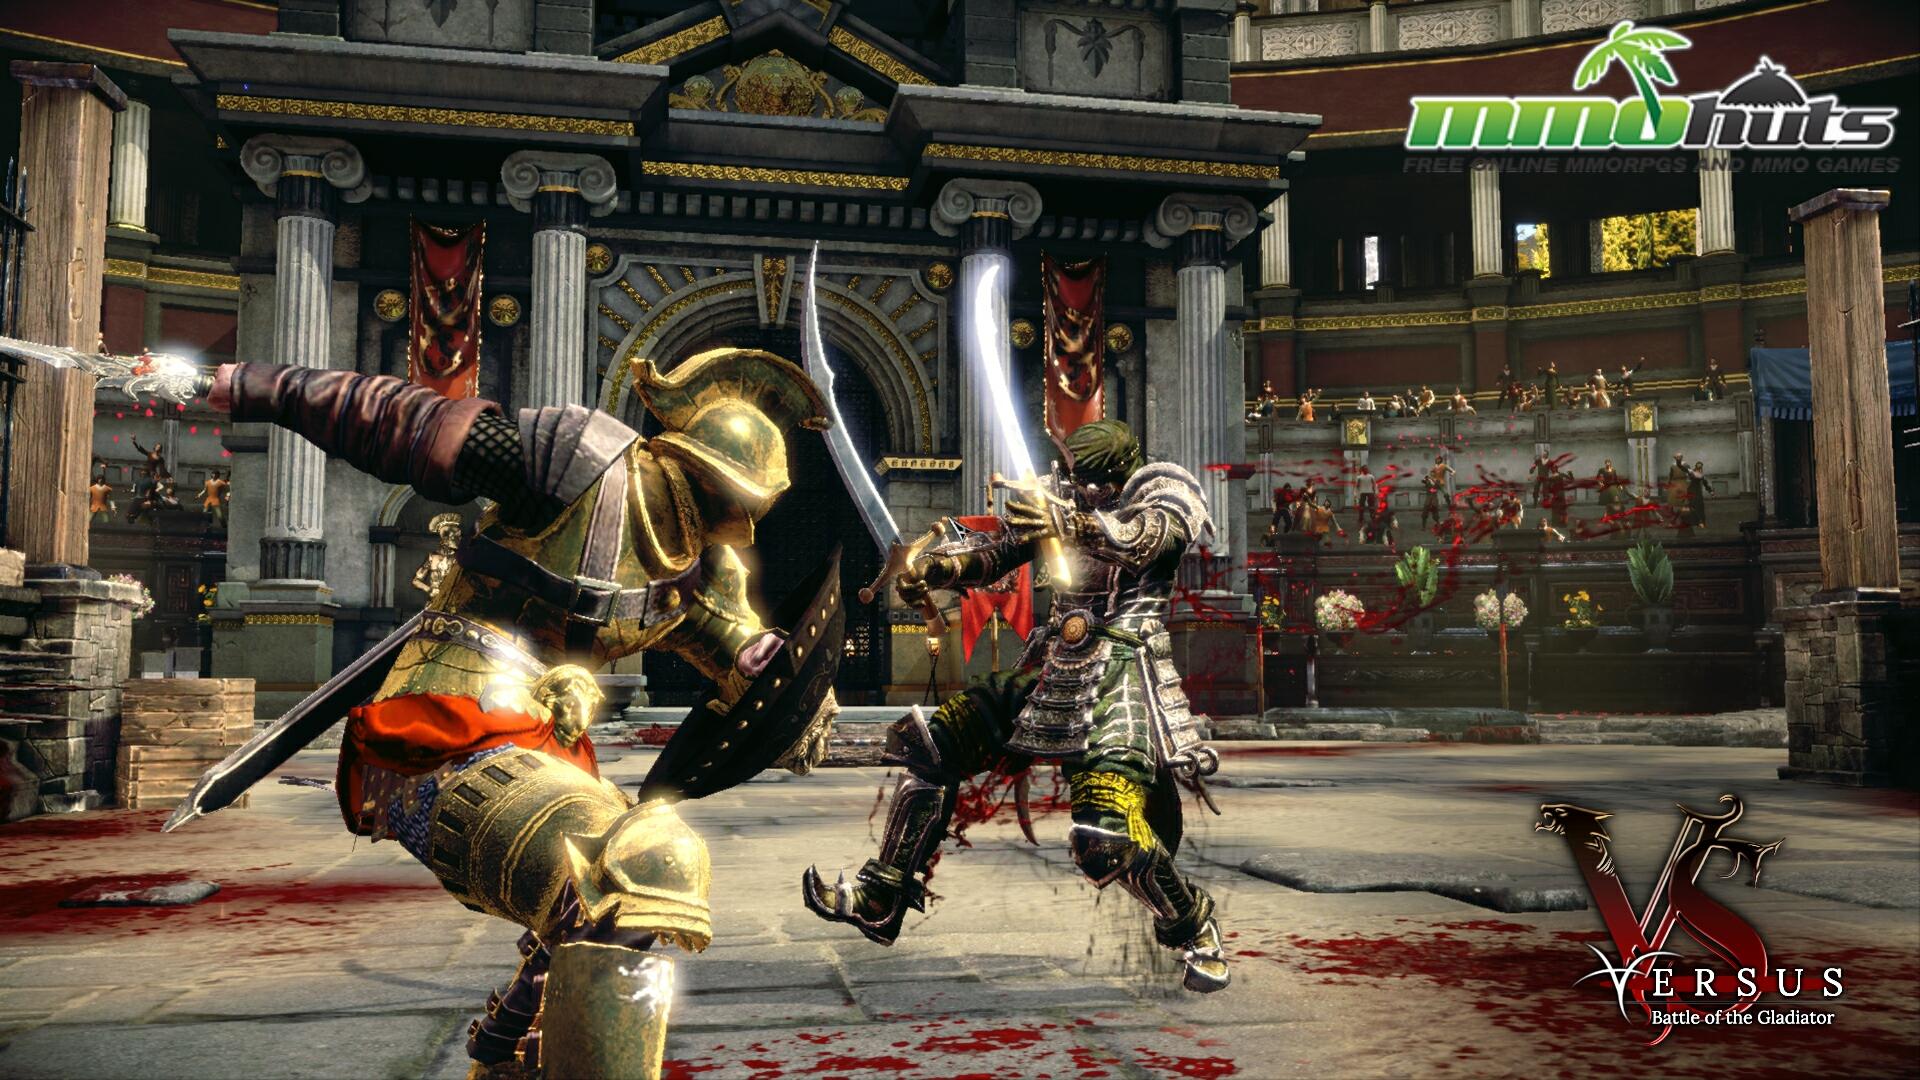 Samurai Sword Girl Wallpaper Versus Battle Of The Gladiator Mmohuts